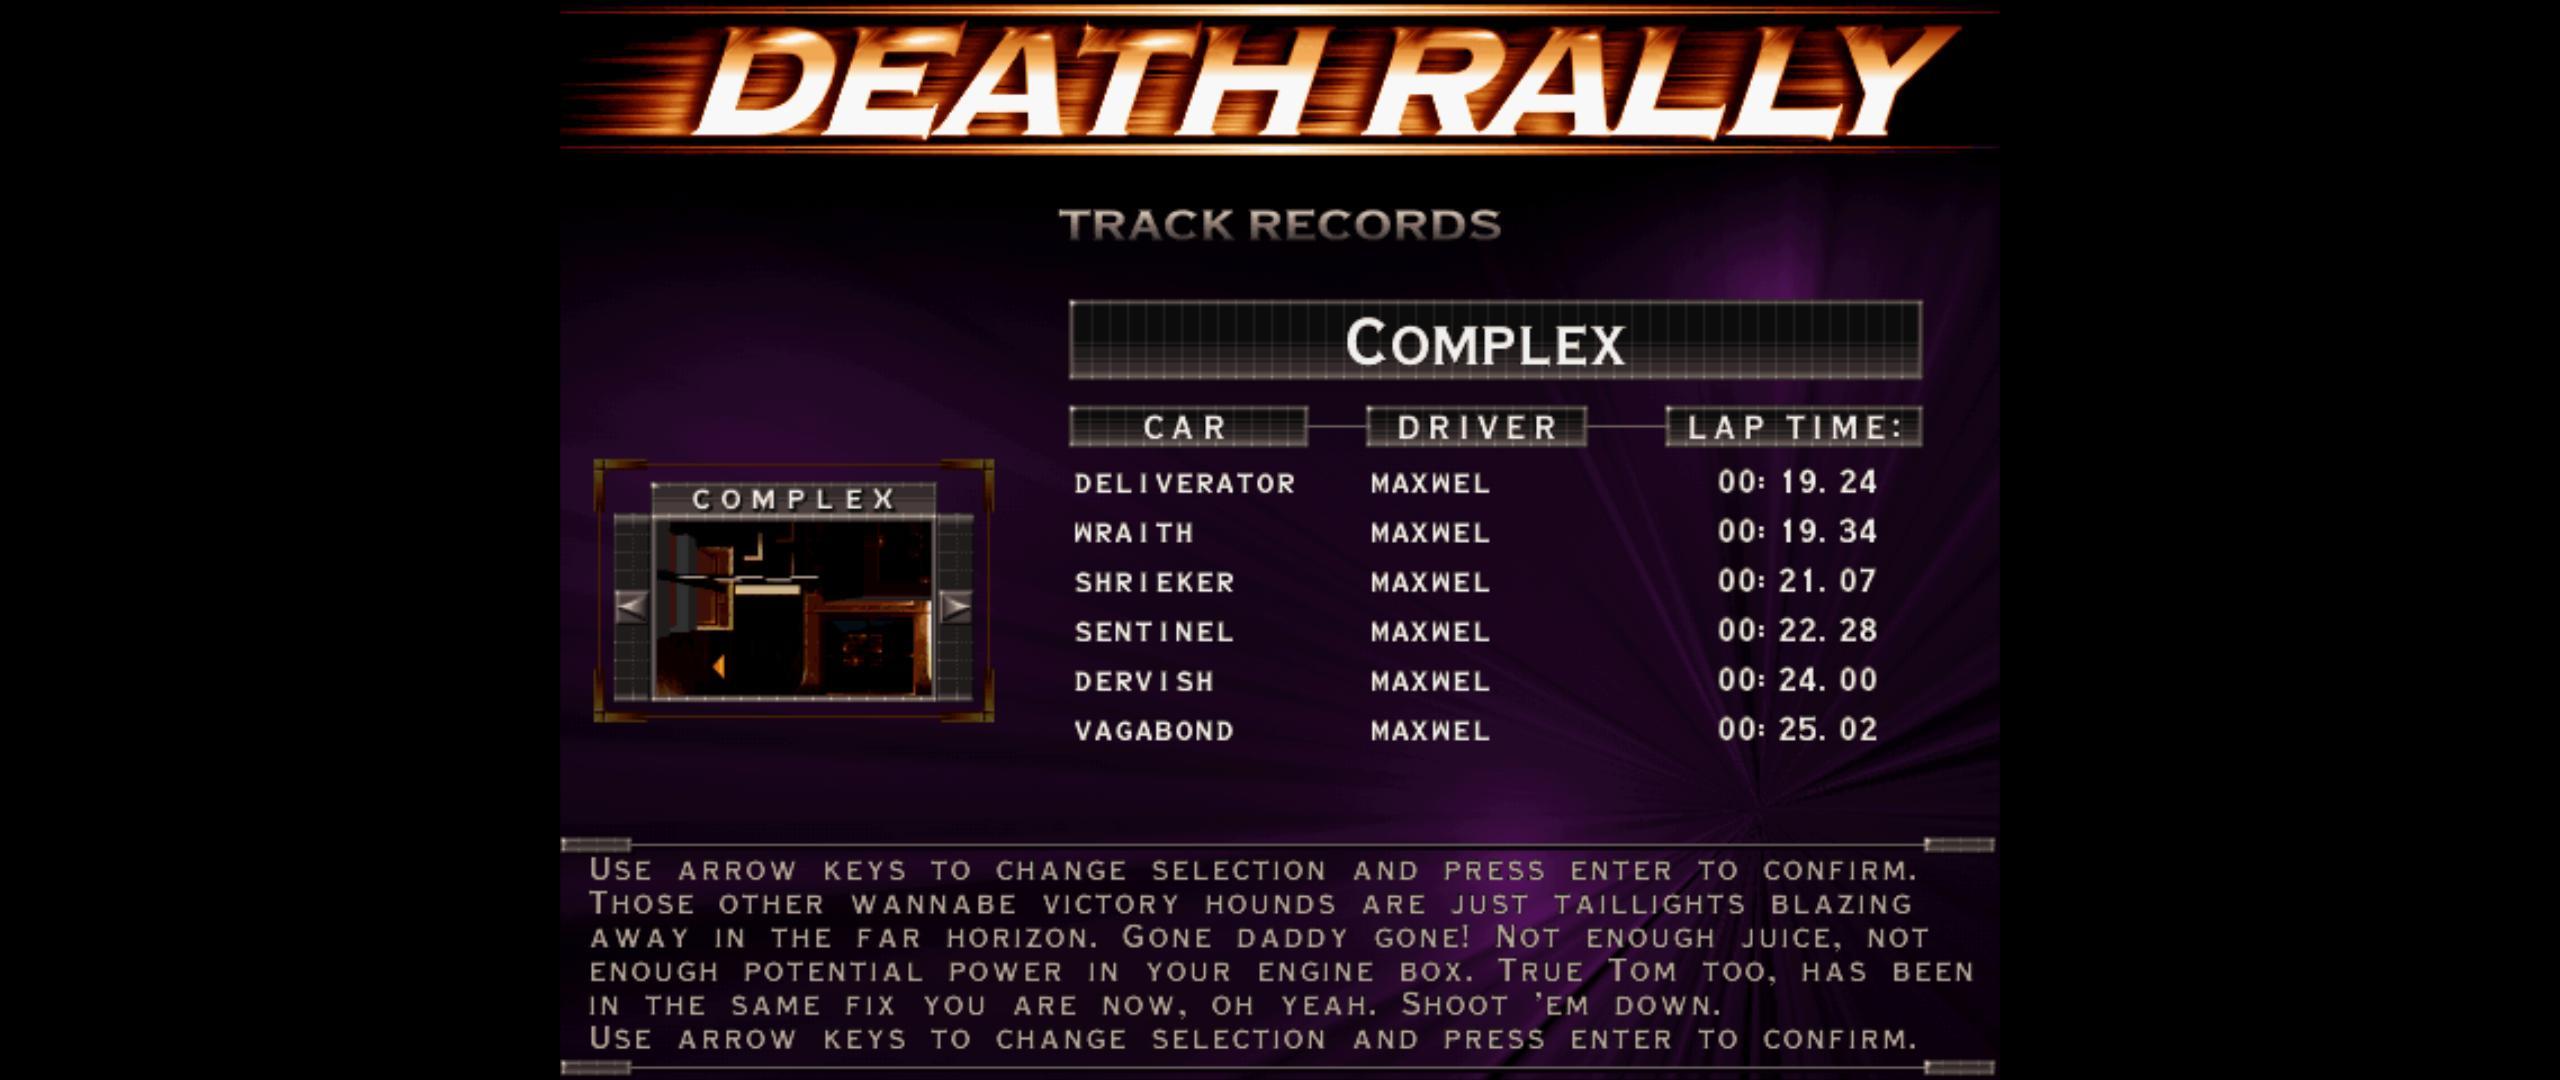 Maxwel: Death Rally [Complex, Vagabond Car] (PC) 0:00:25.02 points on 2016-03-04 07:41:11